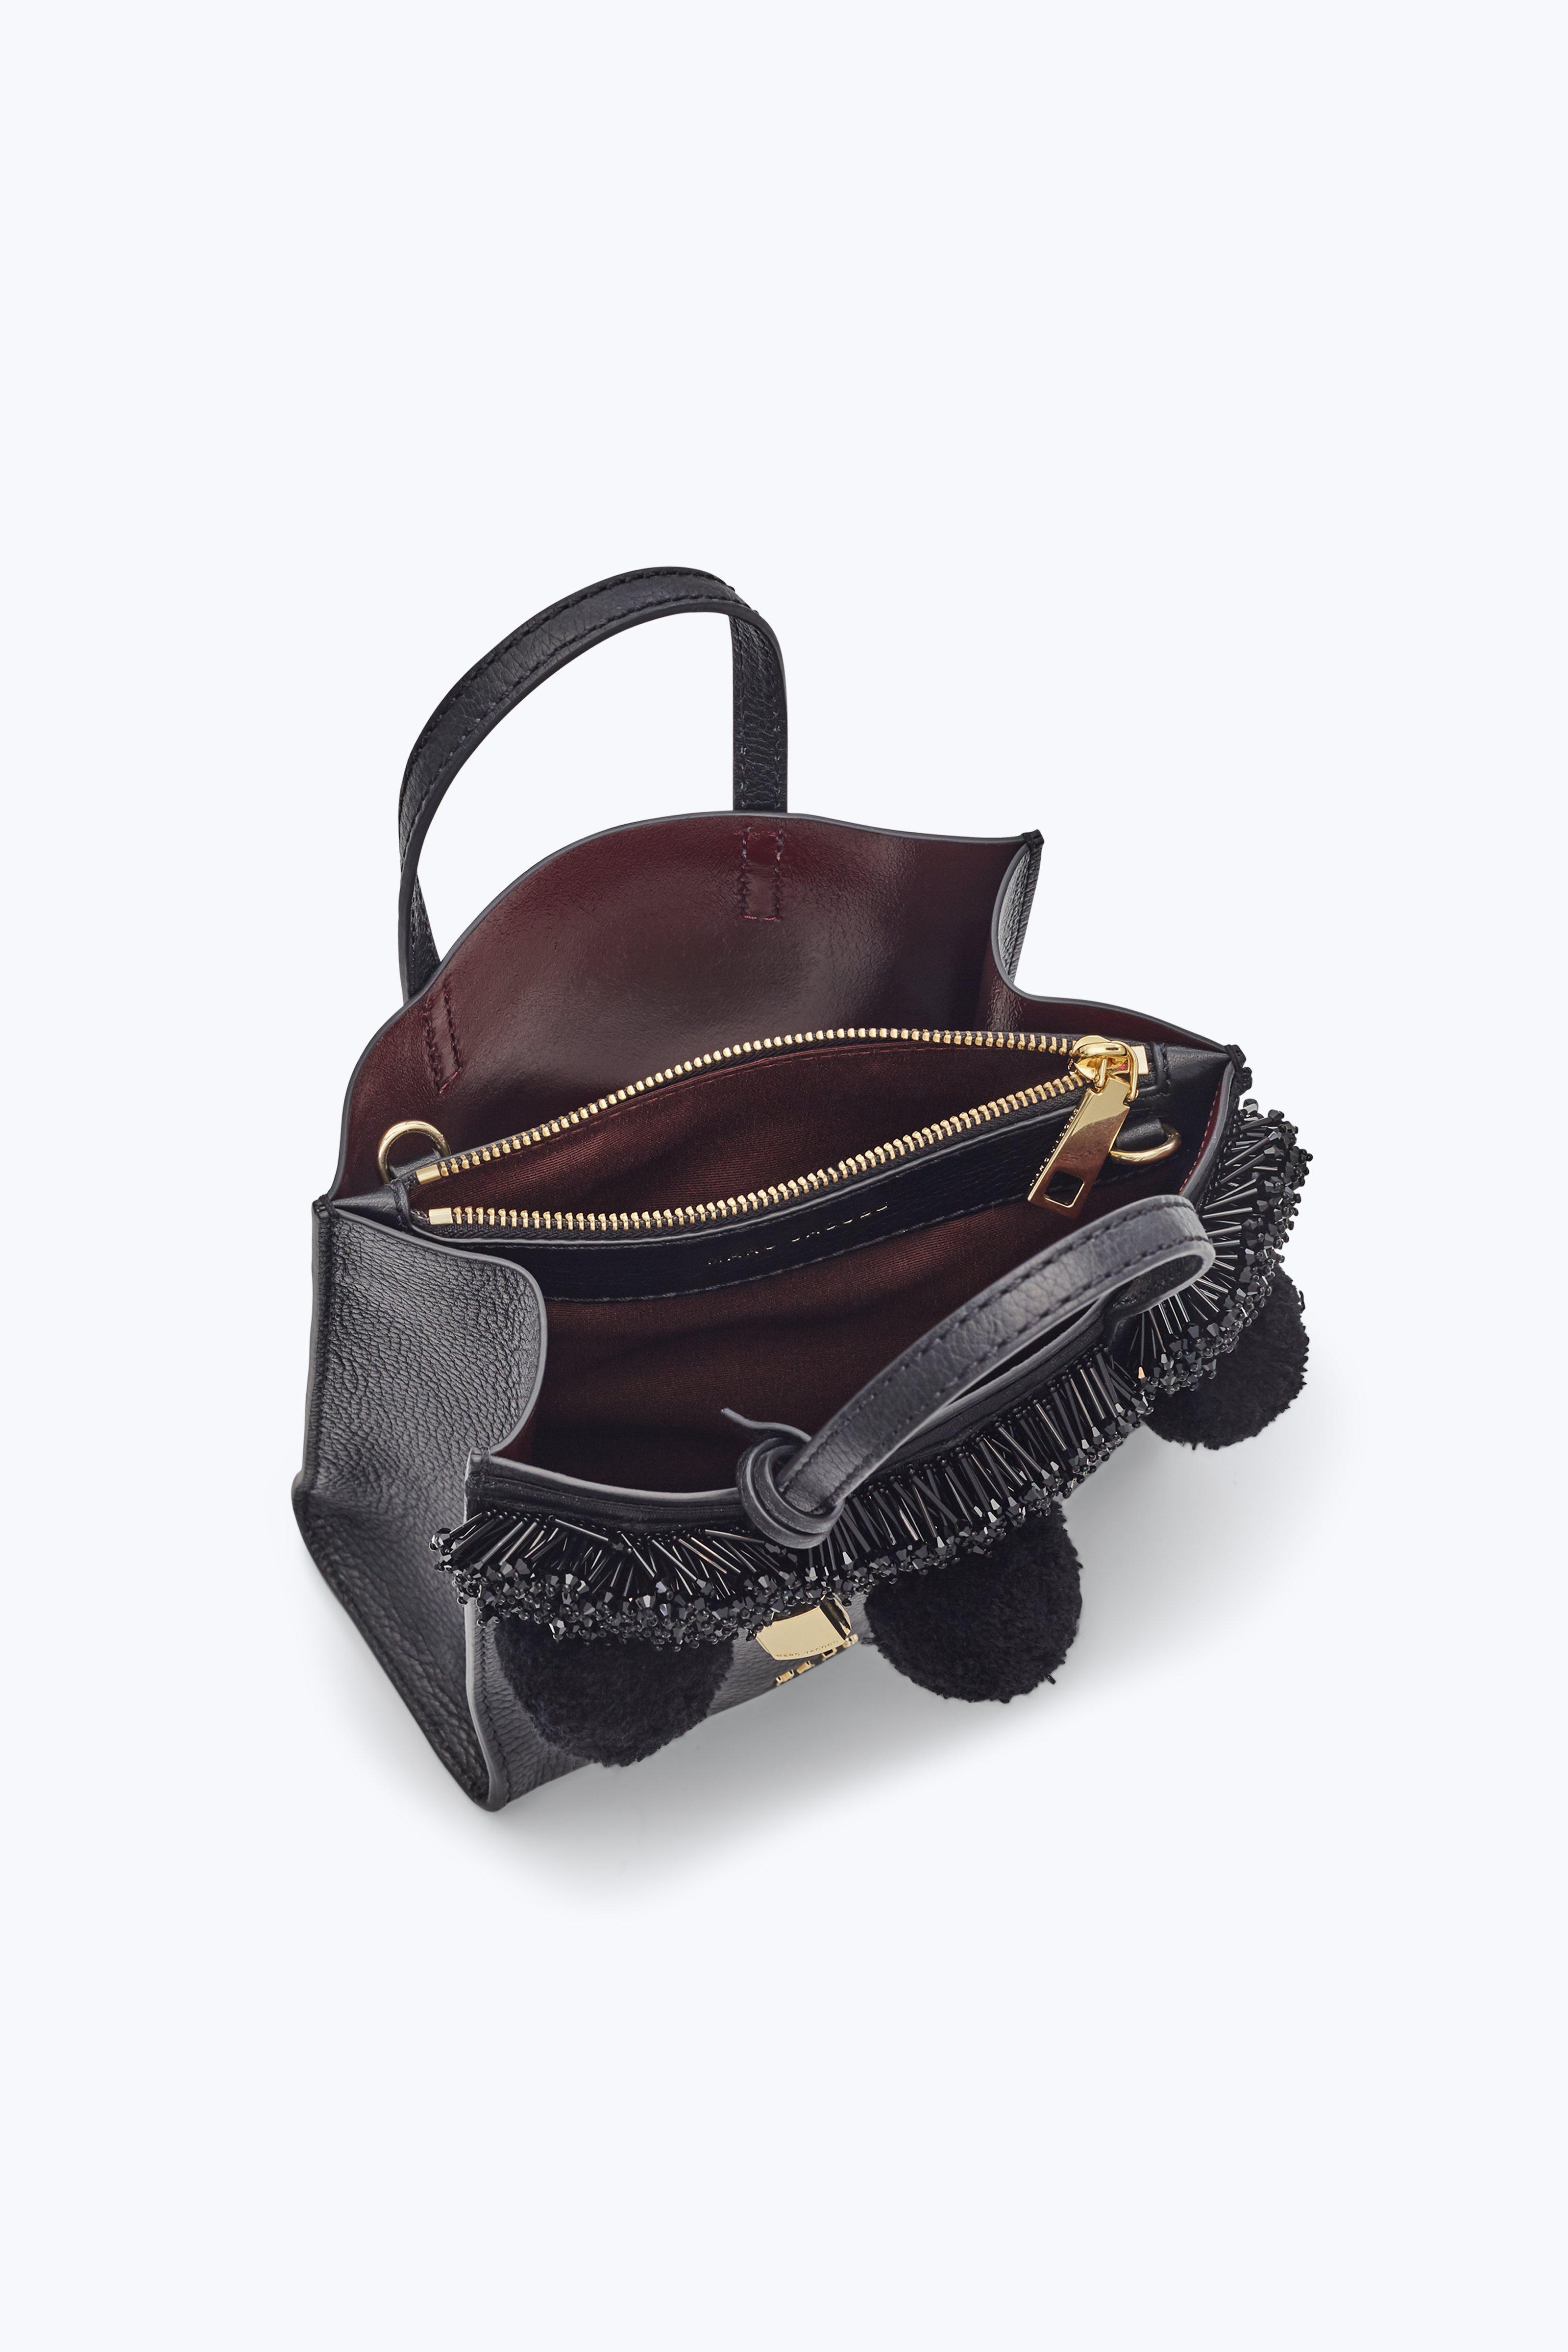 302e07848d26 Lyst - Marc Jacobs The Beads   Pompoms Mini Grind Bag in Black